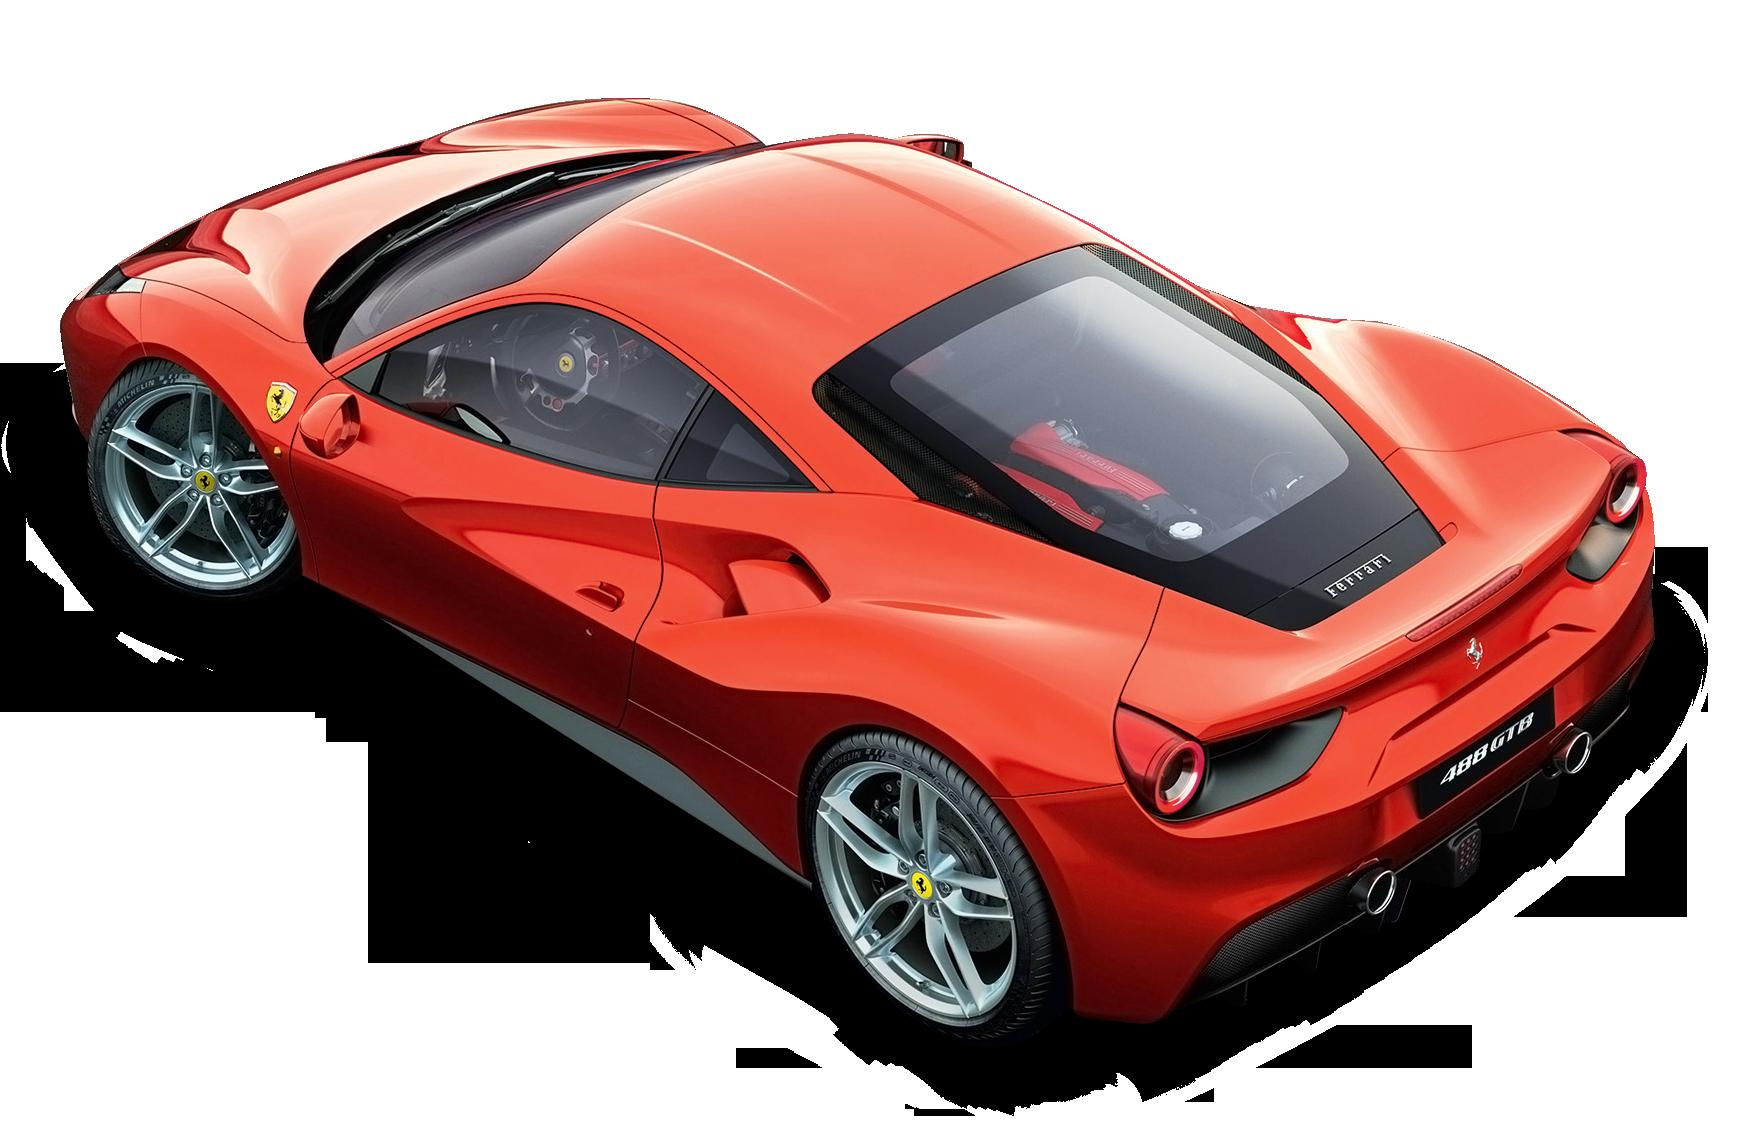 Red Ferrari Top View Car